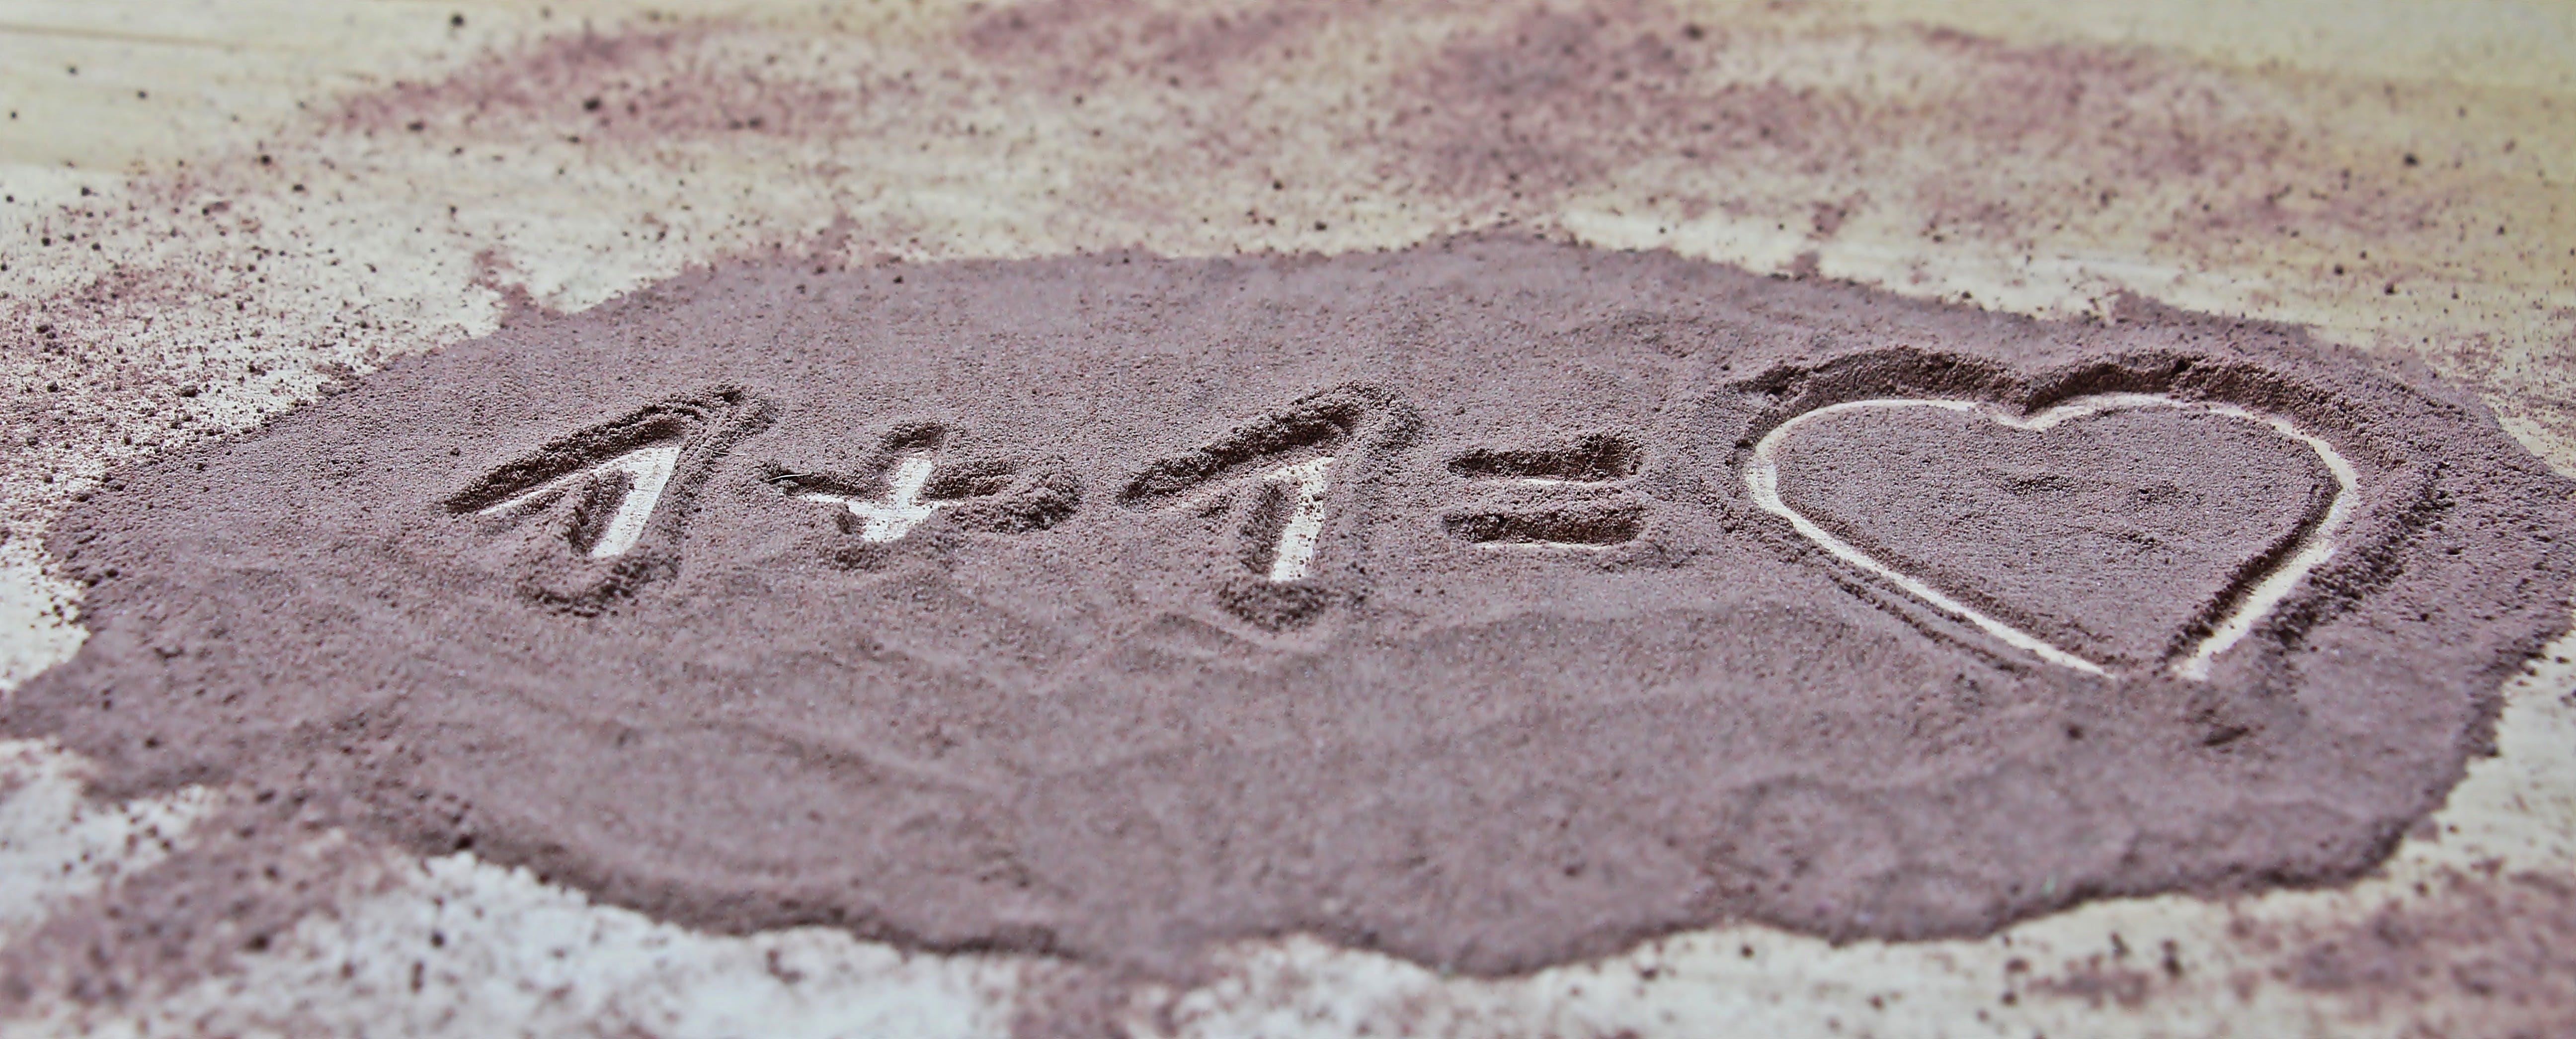 1 + 1 = Heart in Sand